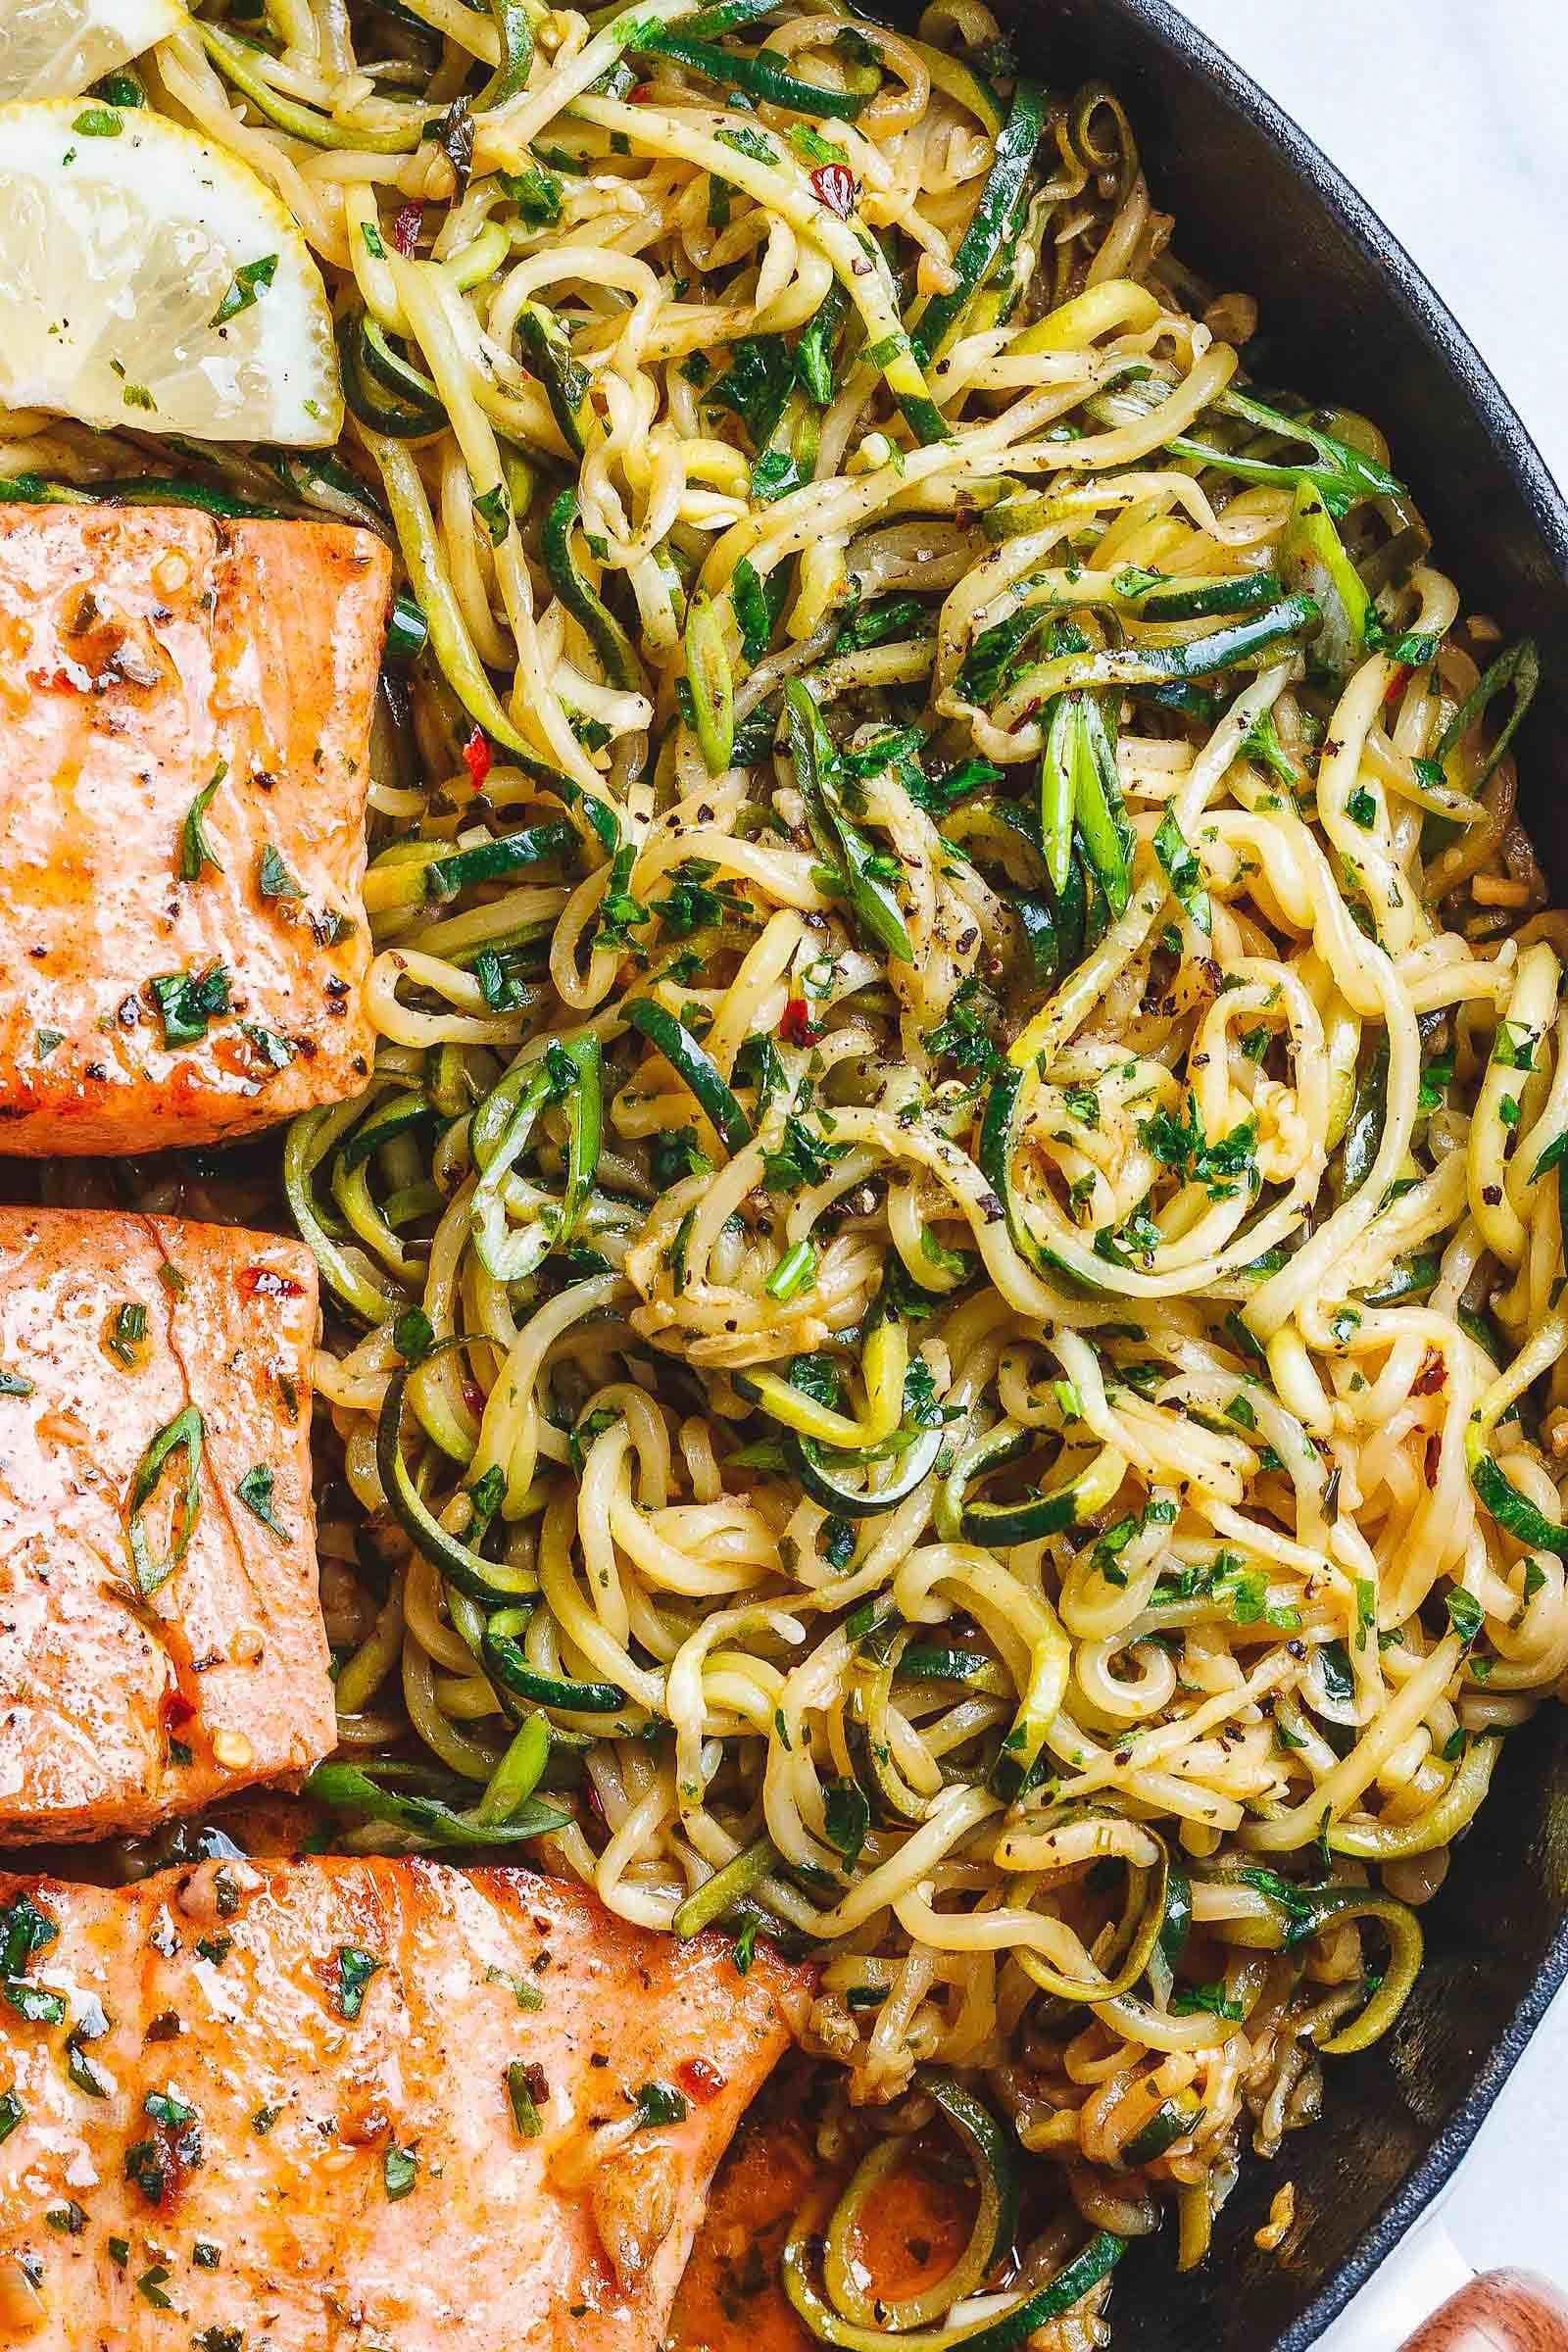 Lemon Garlic Butter Salmon with Zucchini Noodles